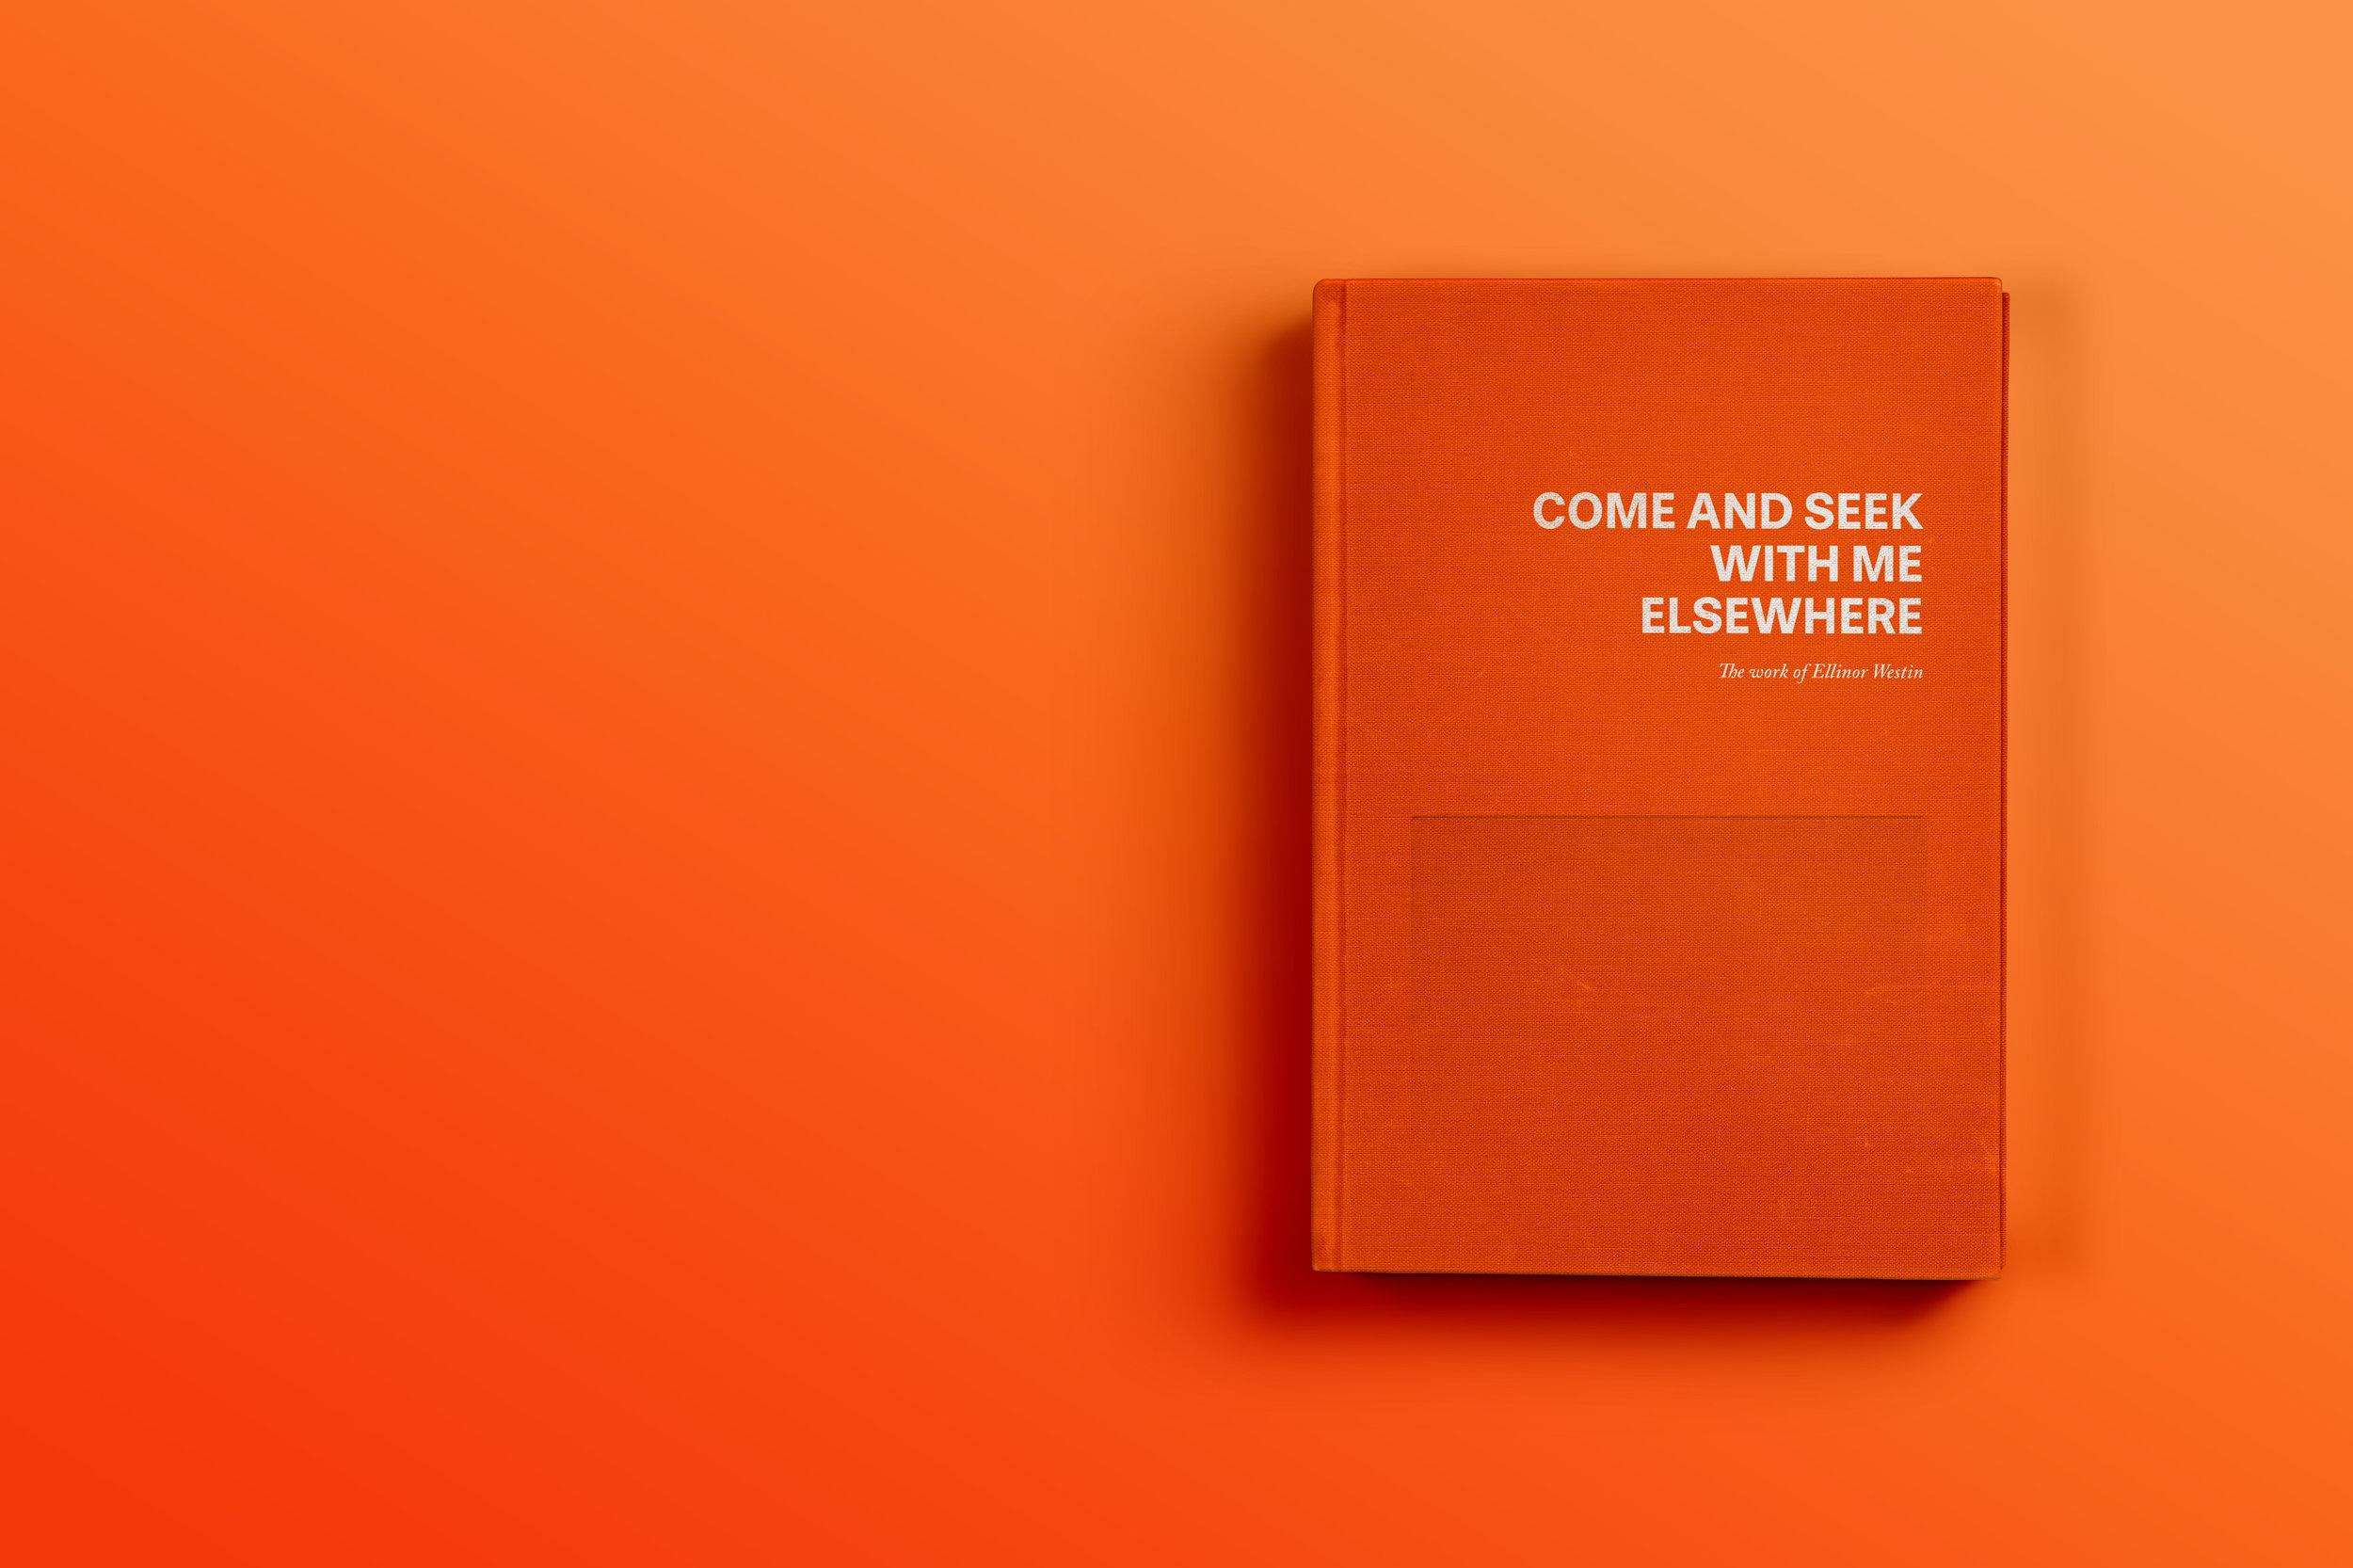 001-Cover-book-2.jpg